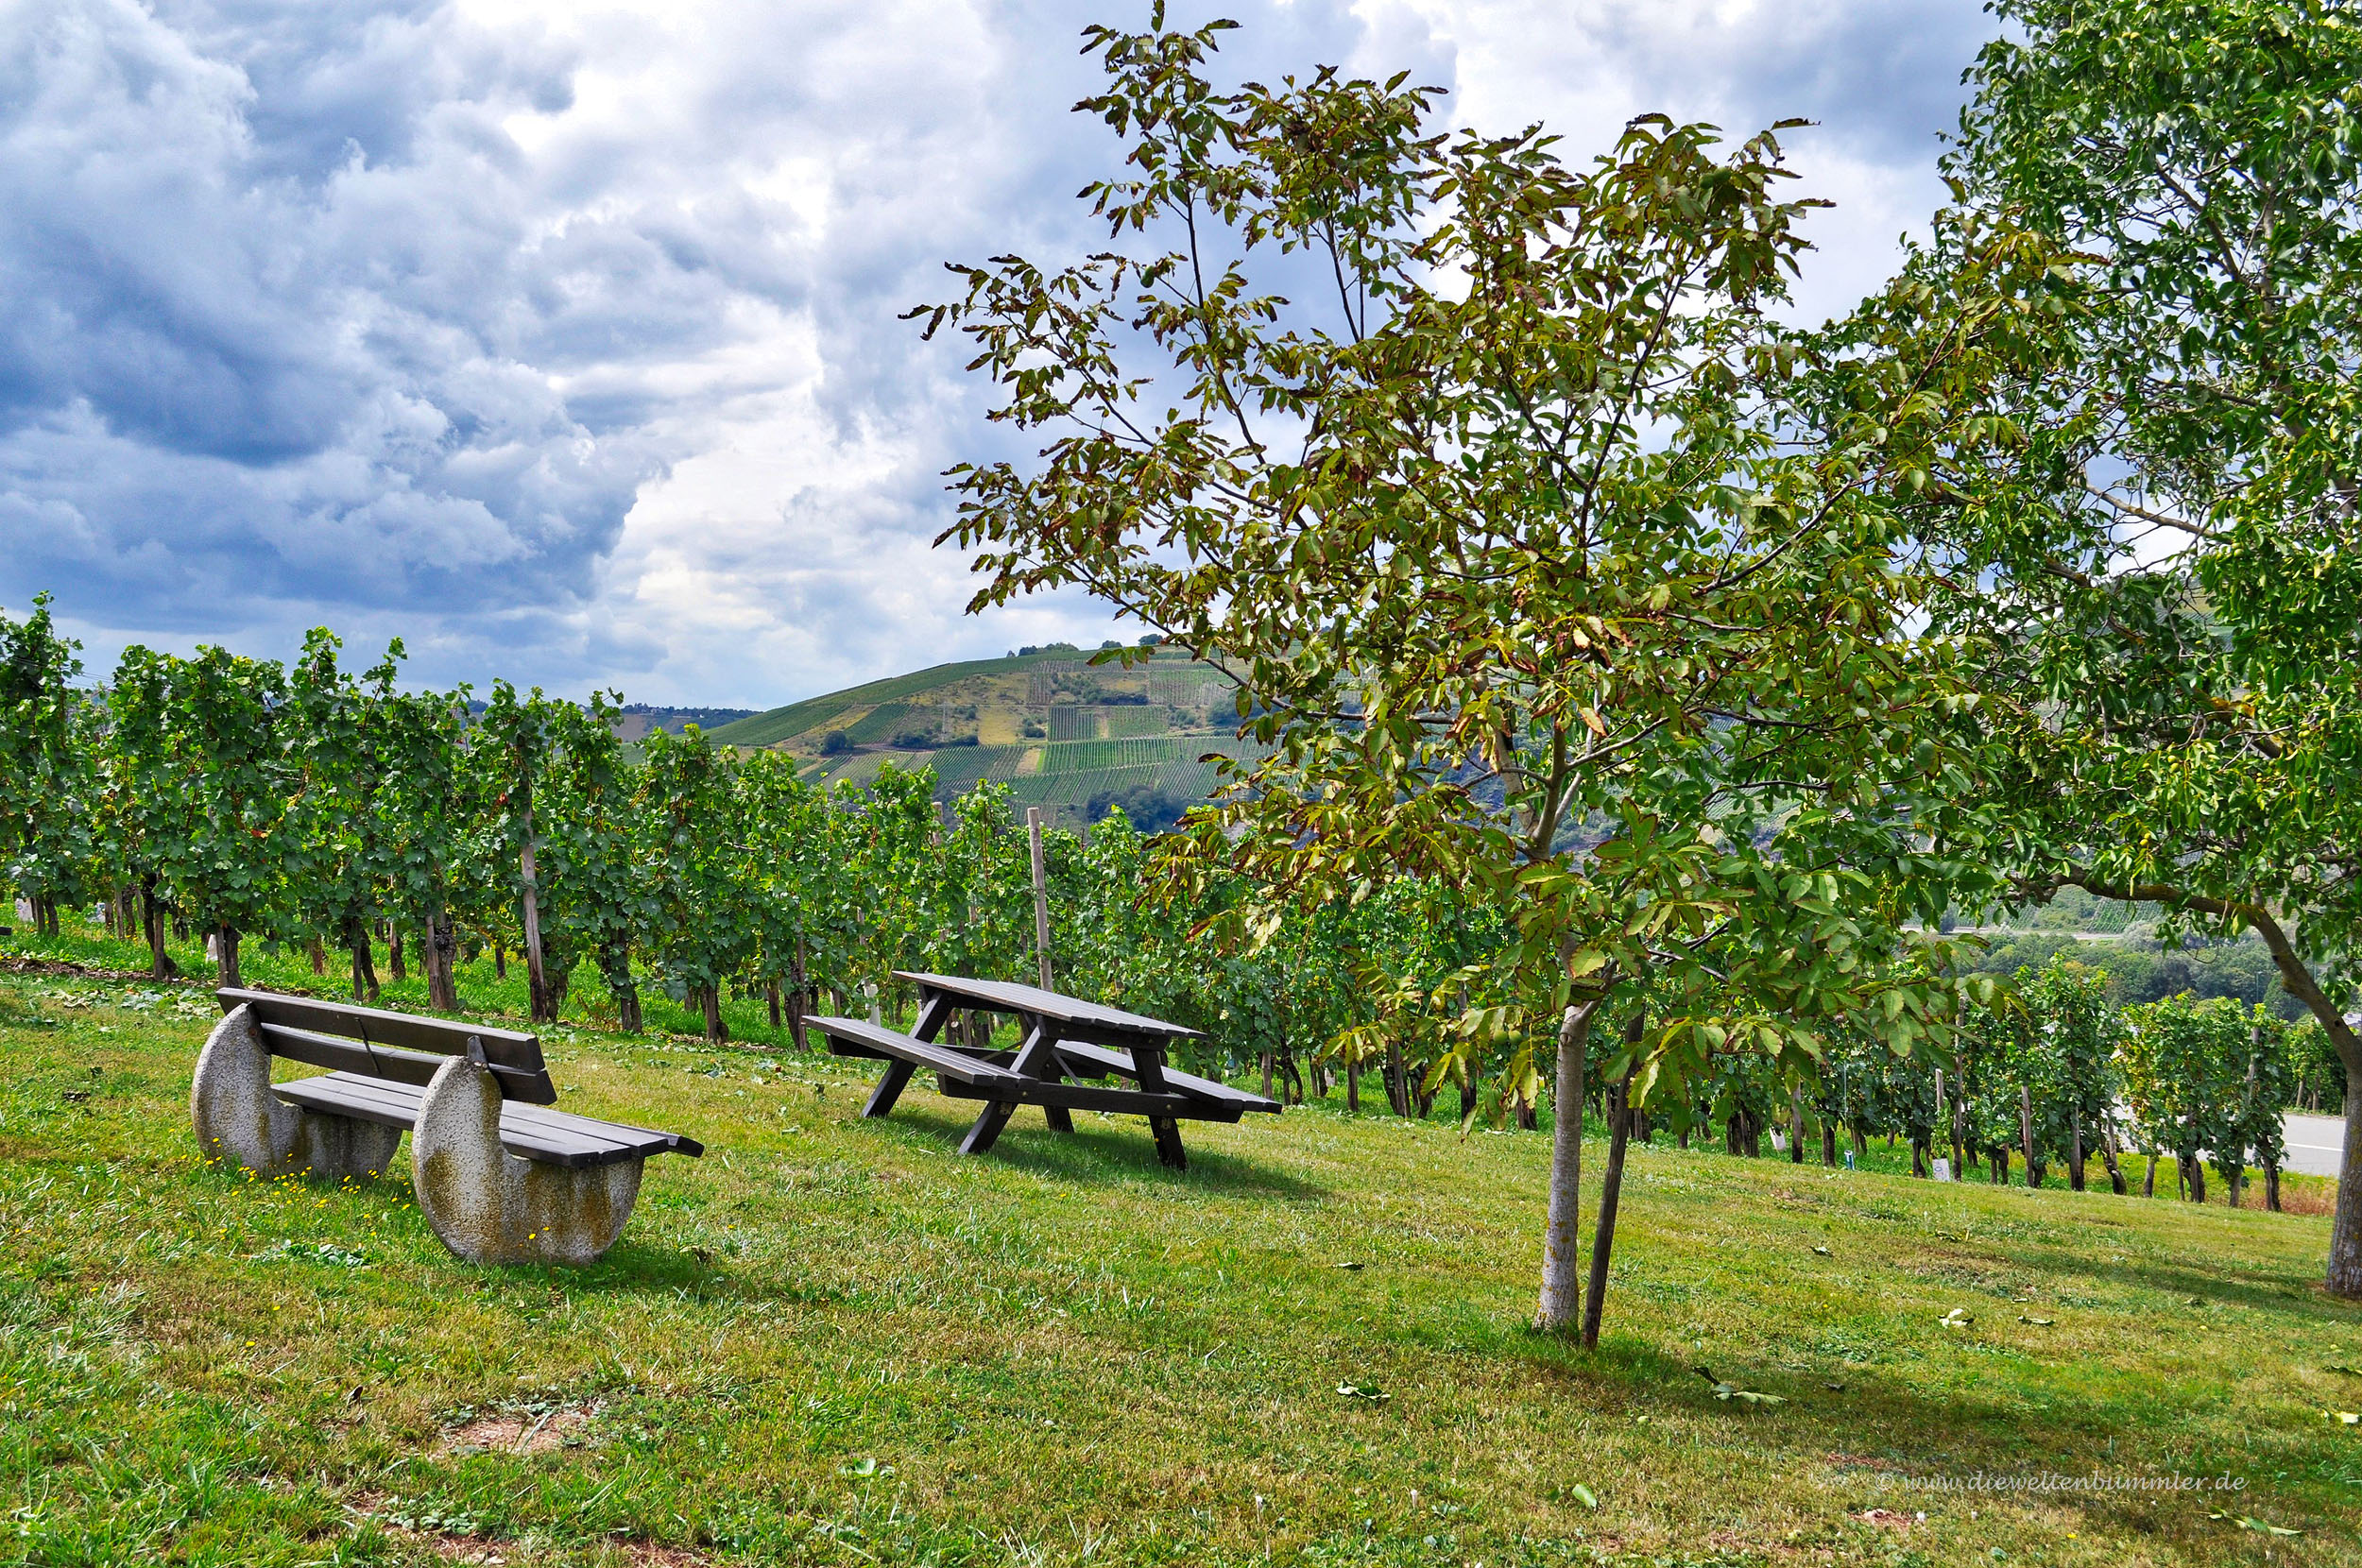 Picknickplatz am Wegesrand